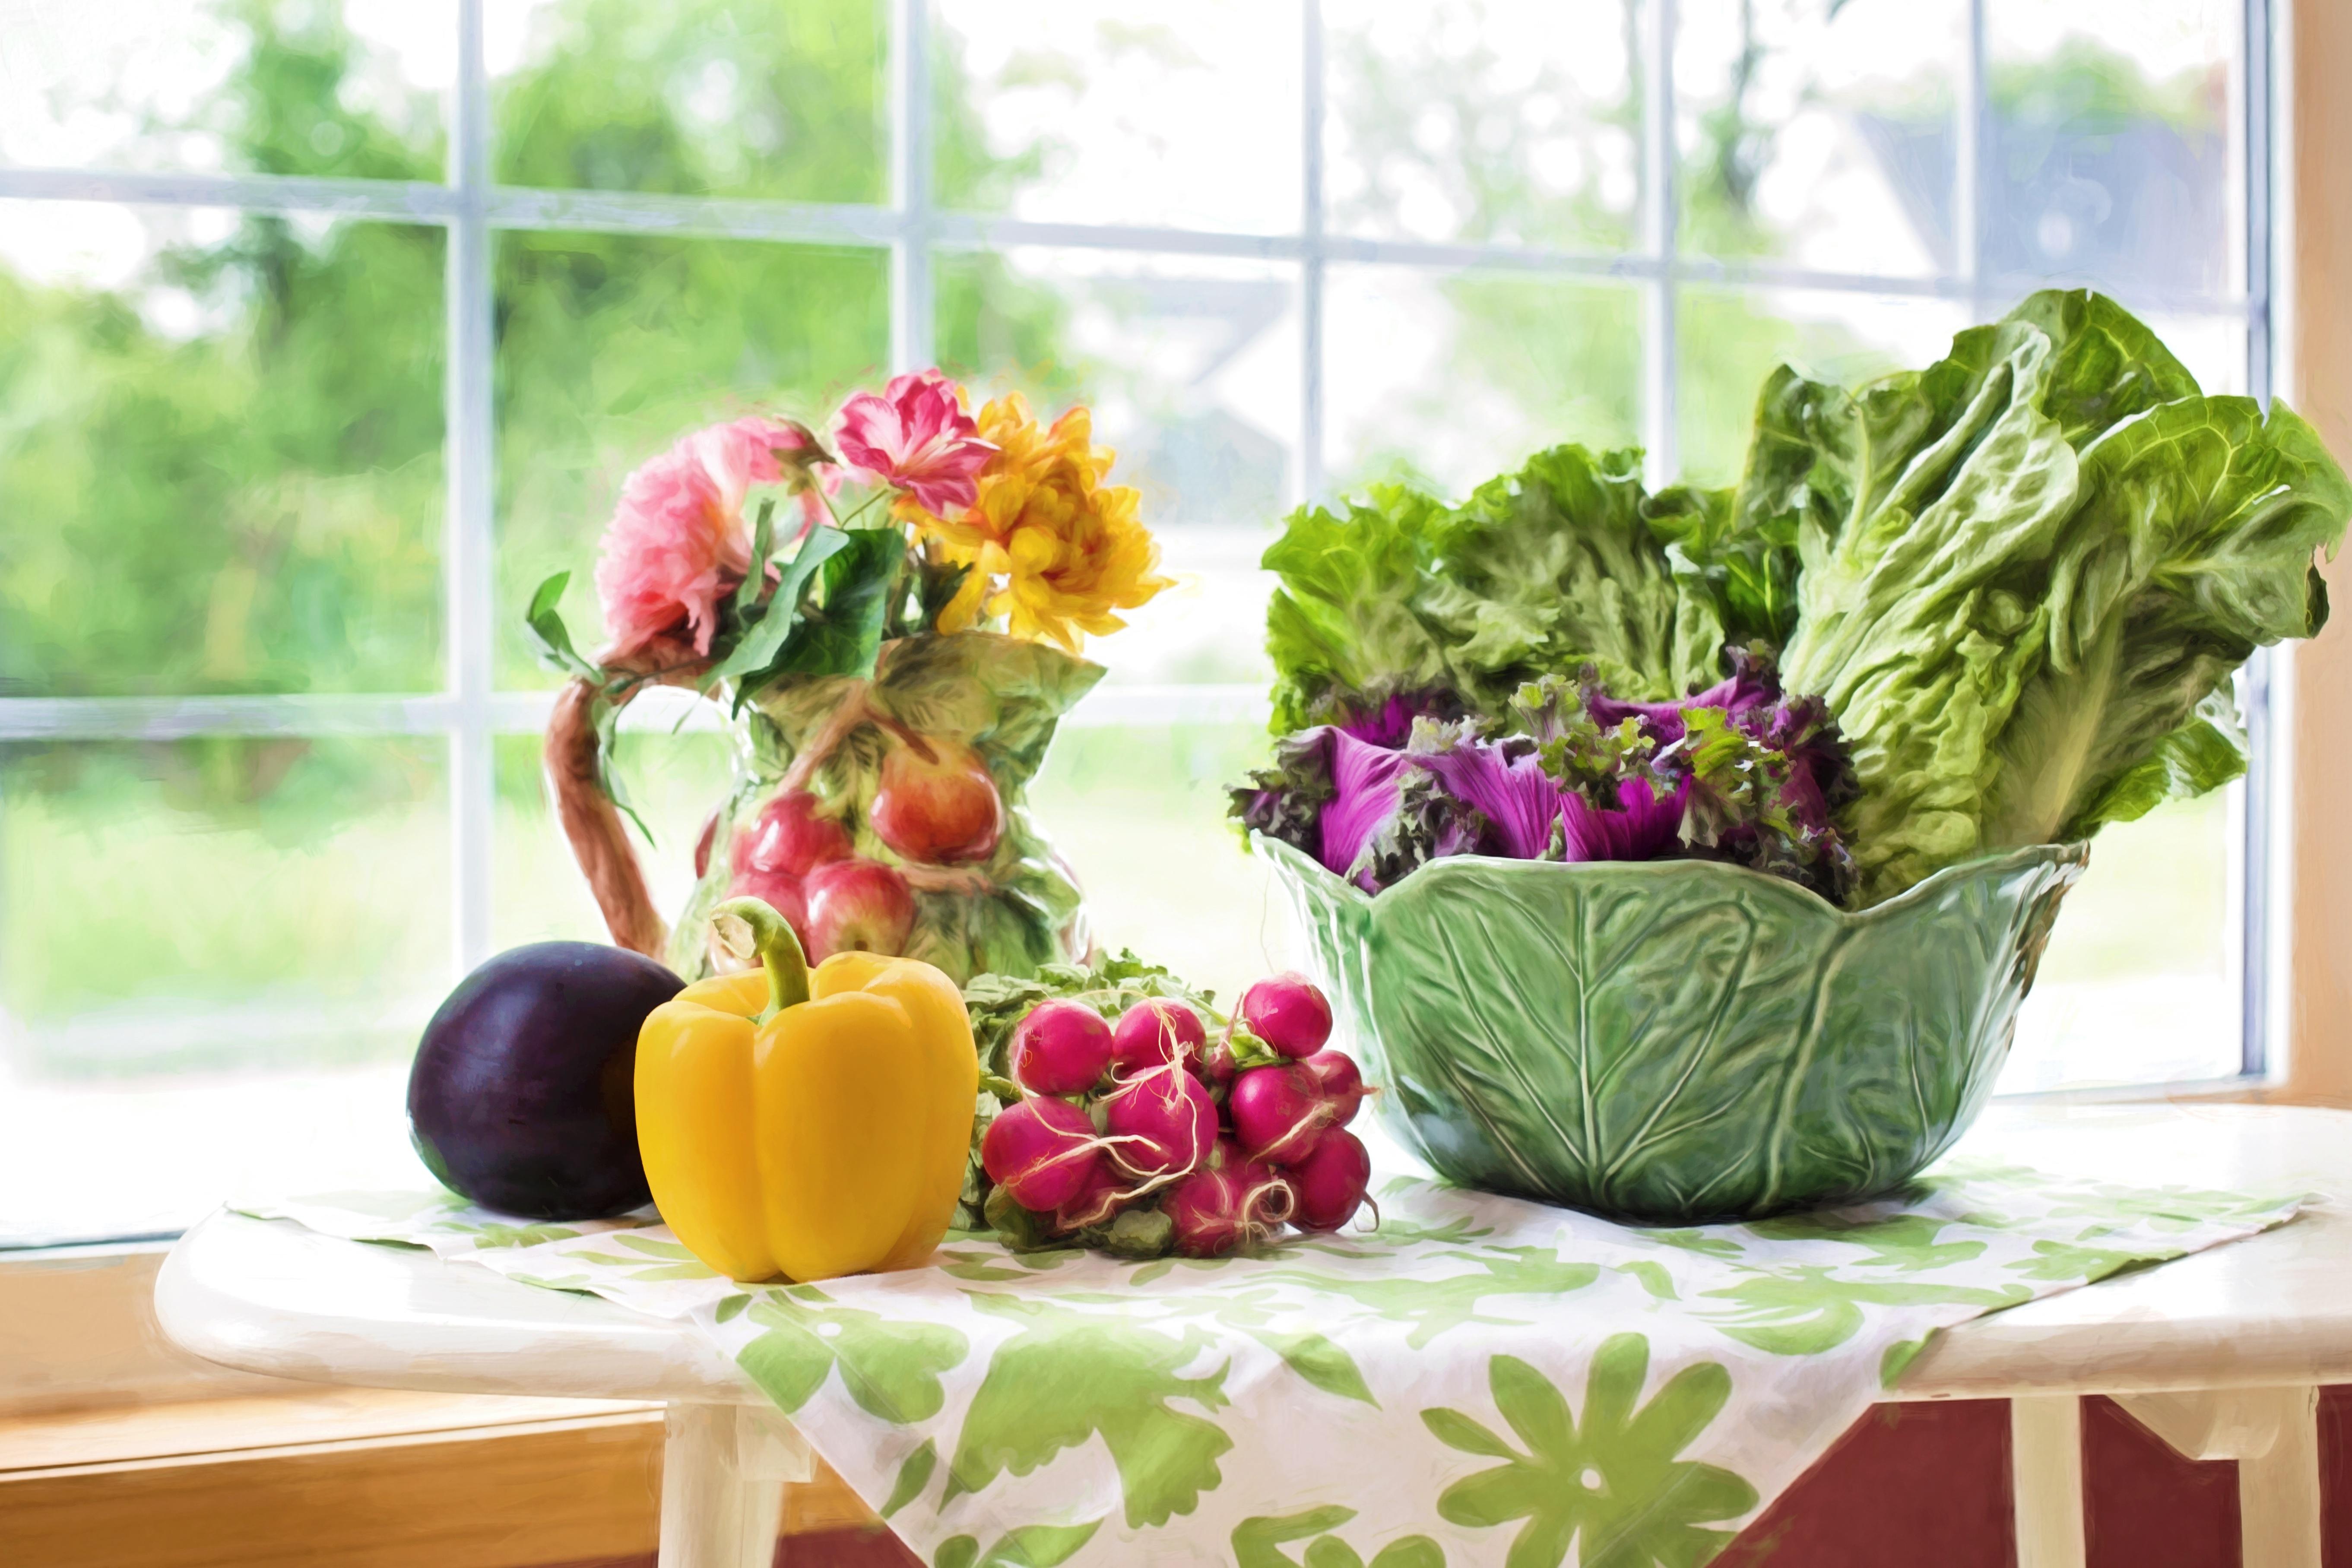 Dieta Settimanale Vegetariana Calorie : Dieta scarsdale vegetariana un classico menù pourfemme